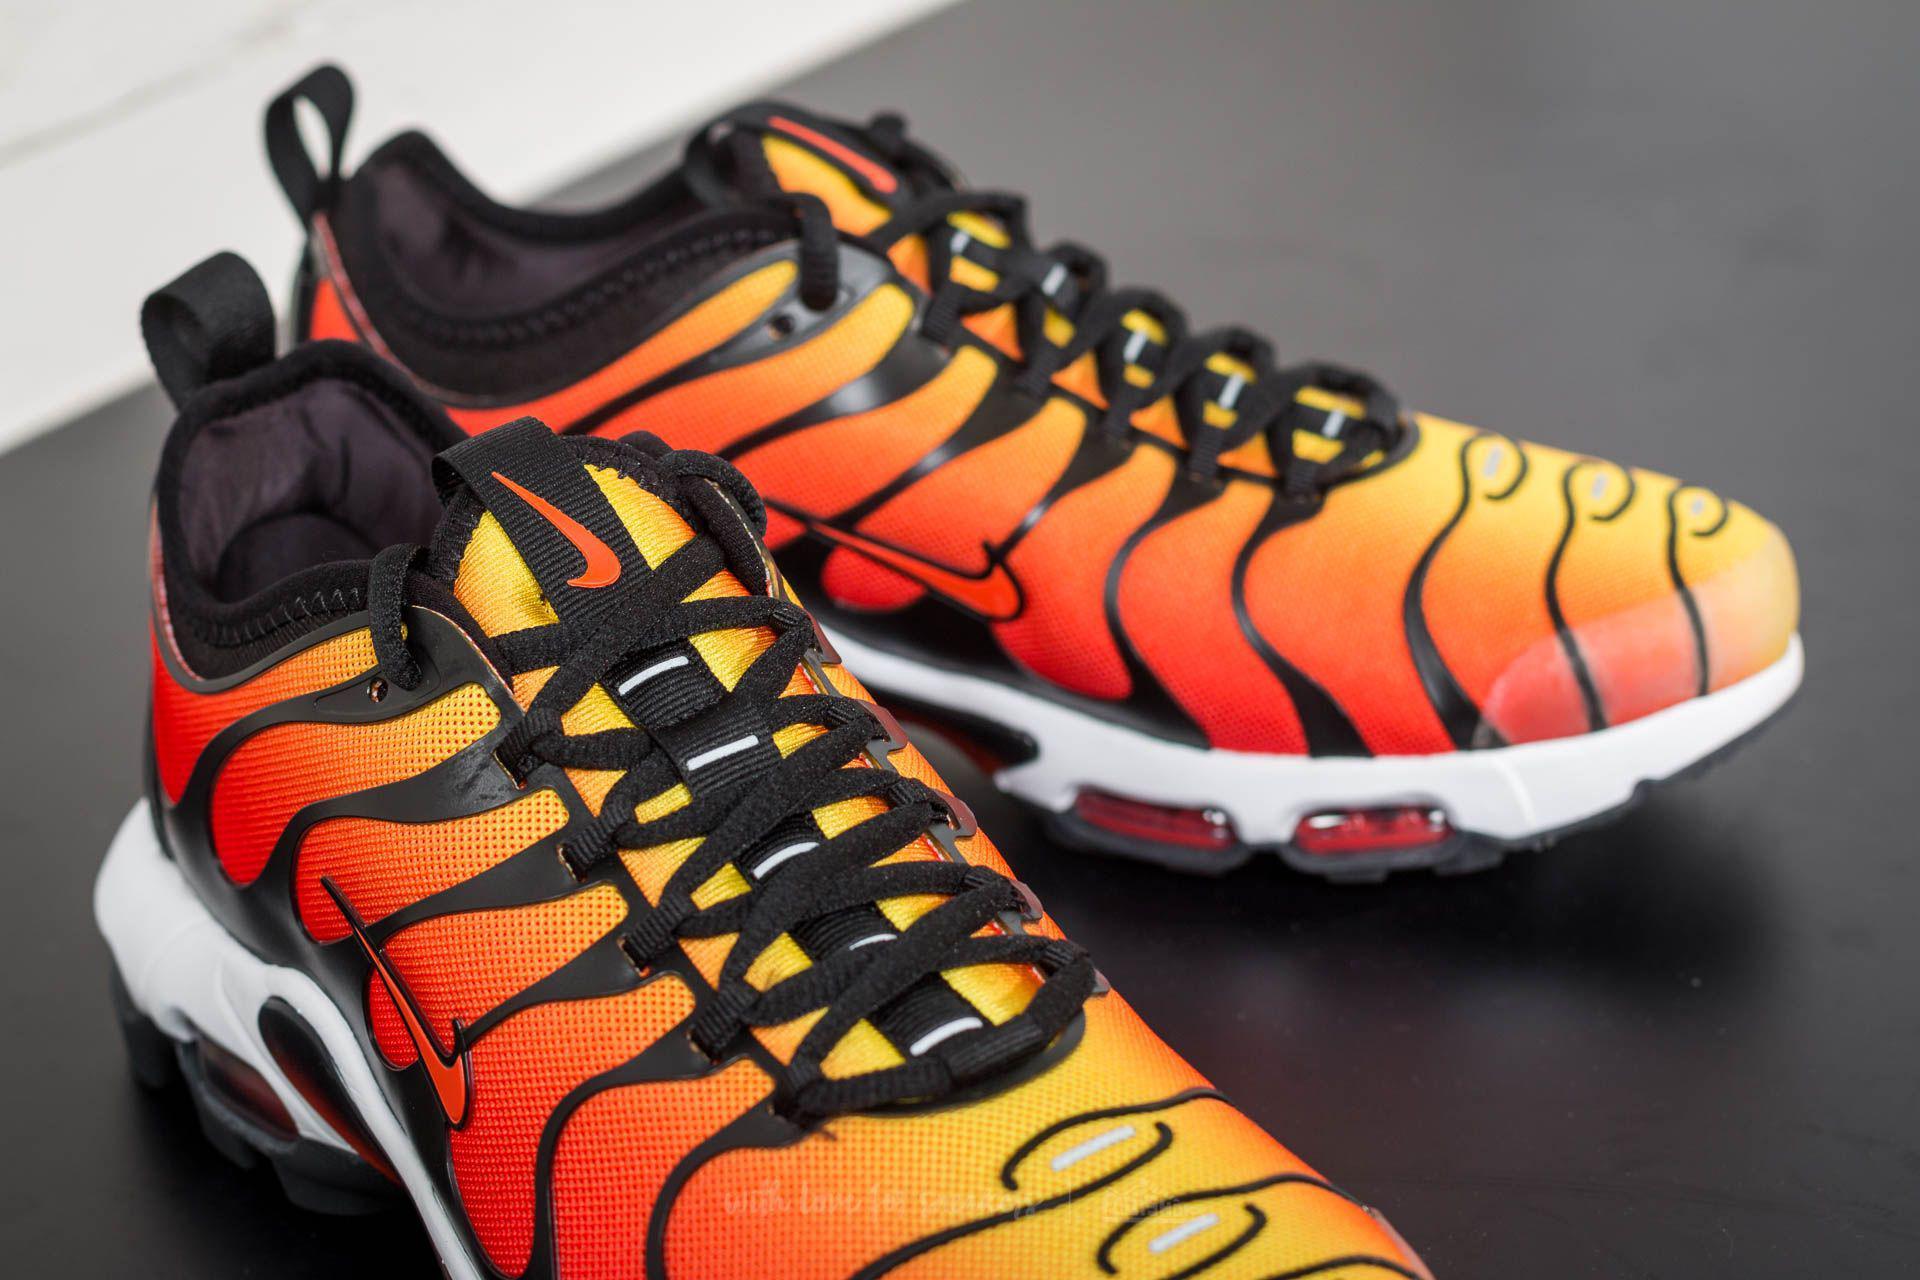 Details about Mens Nike Air Max Plus TN Ultra 898015 004 Tiger Black Tour Yellow Orange Tr